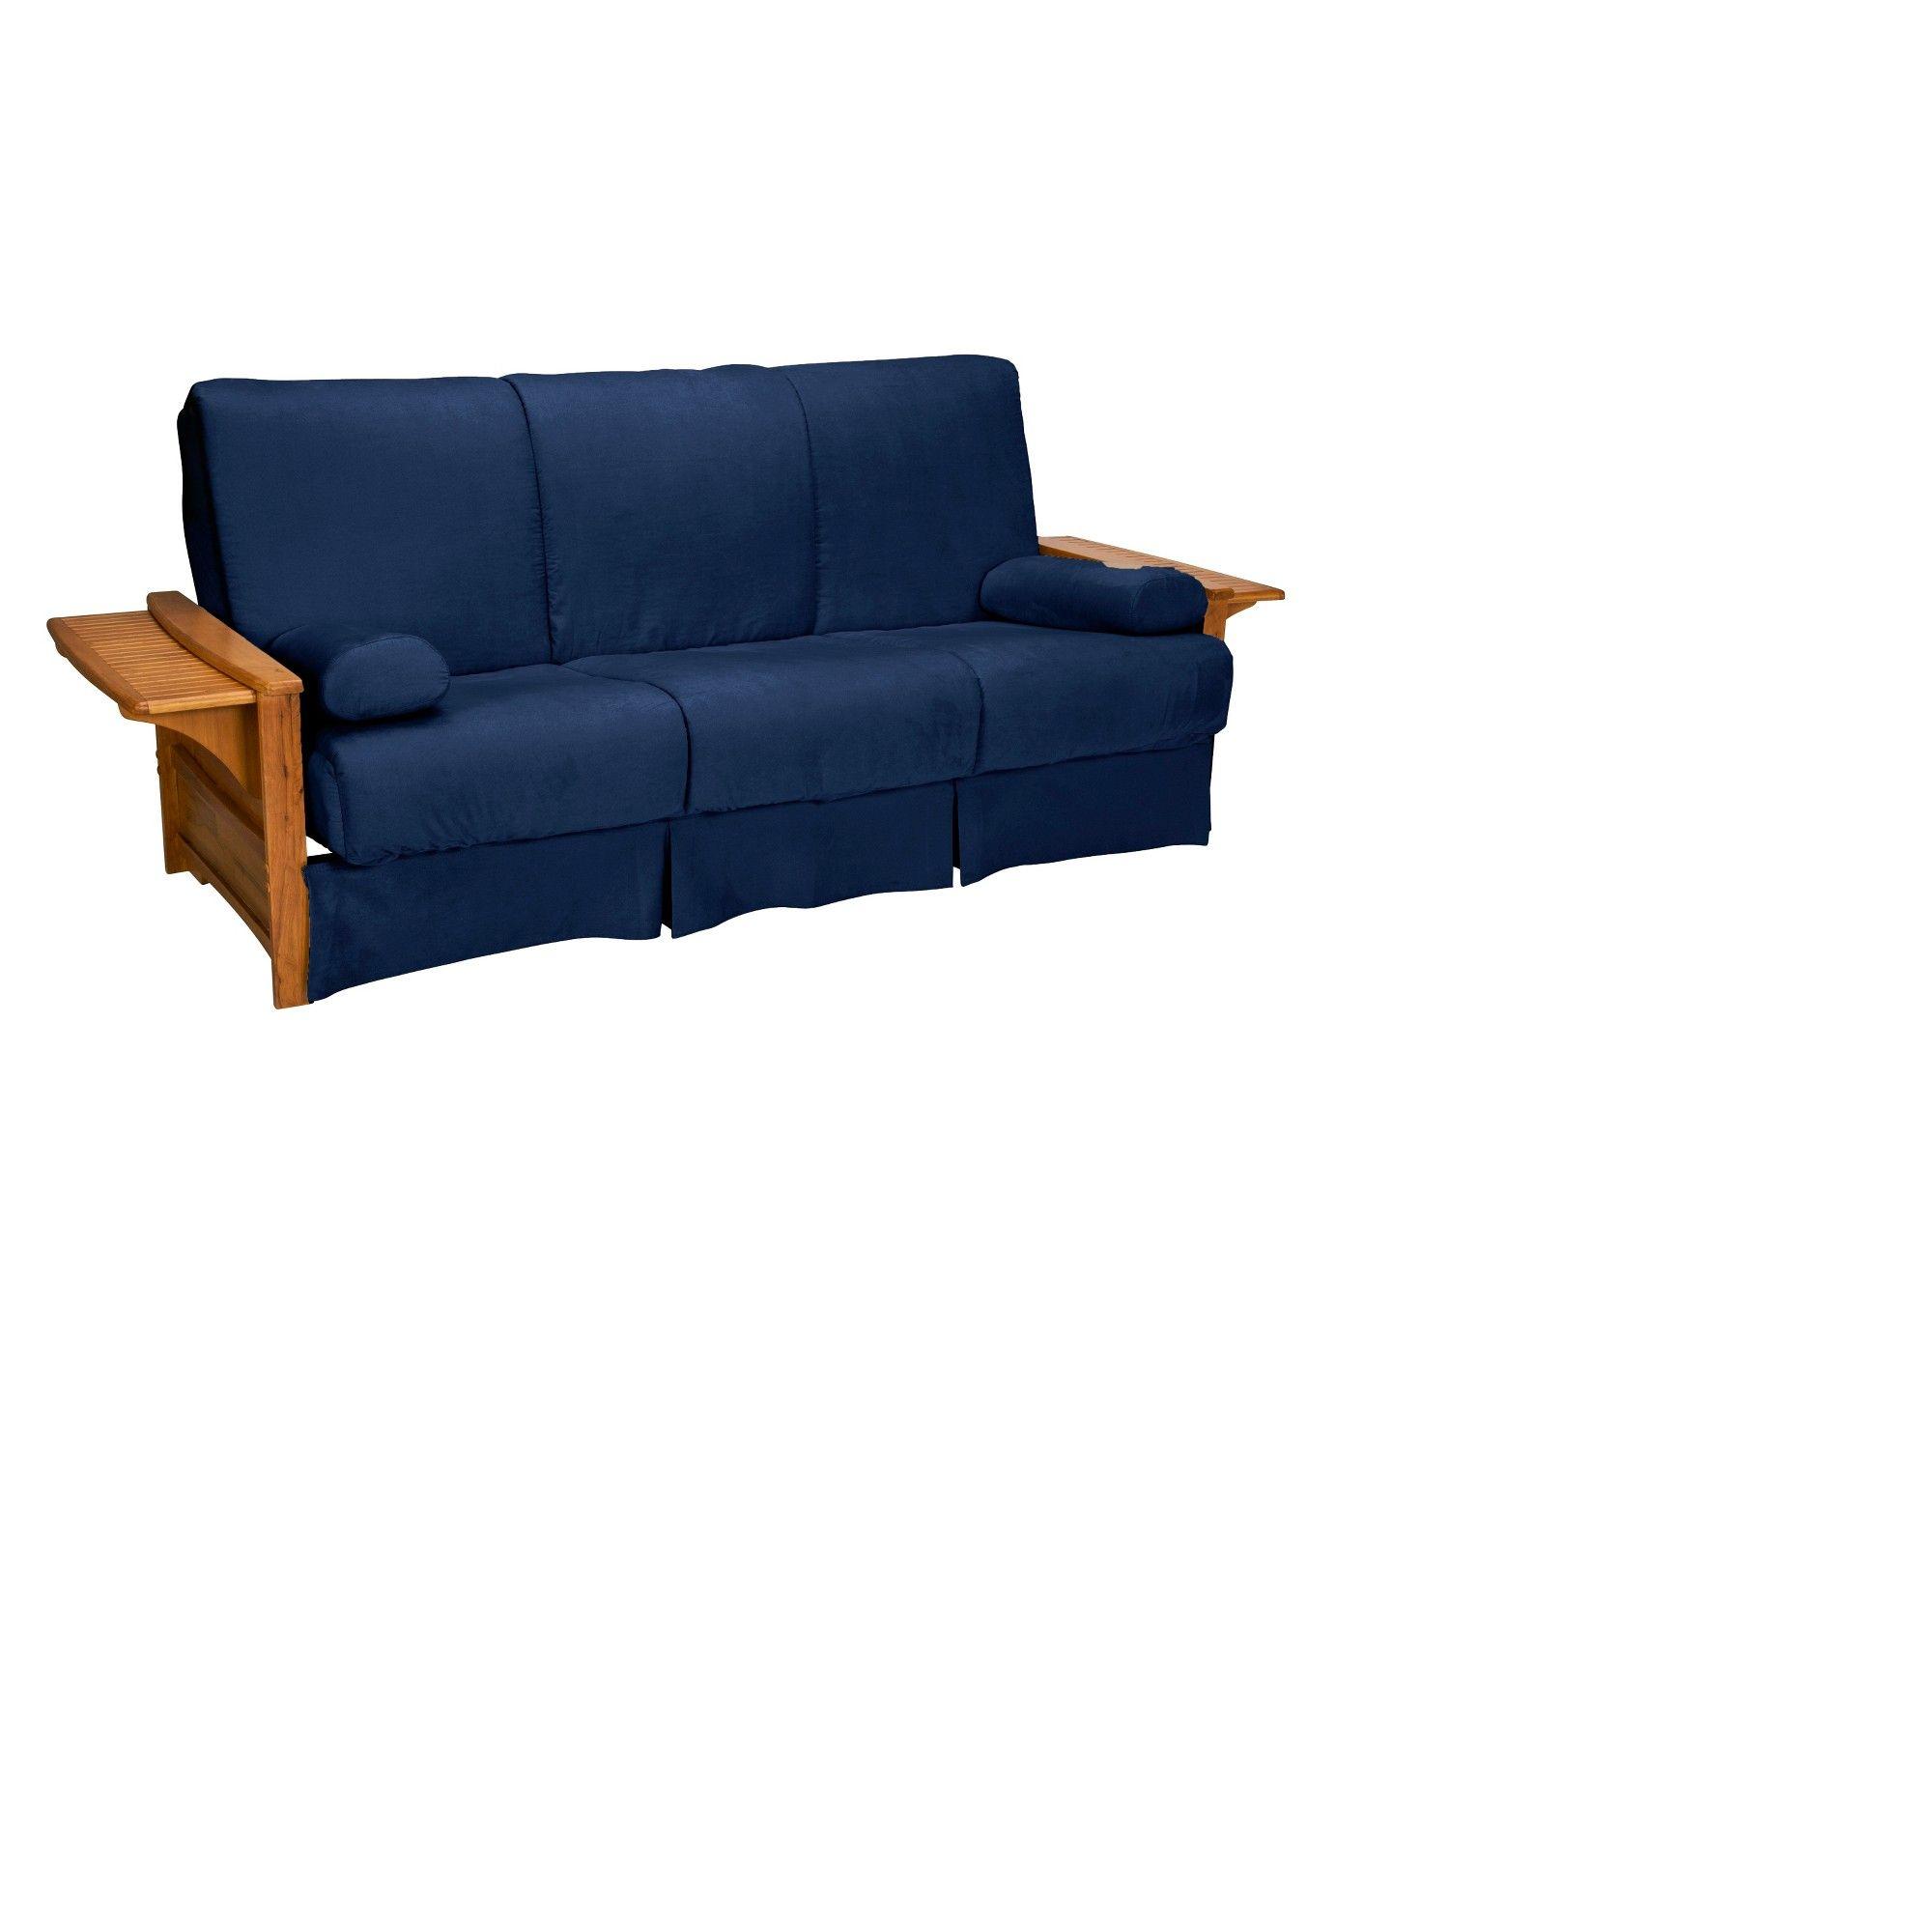 Brooklyn Perfect Futon Sofa Sleeper Medium Oak Wood Finish Dark Blue Upholstery Queen